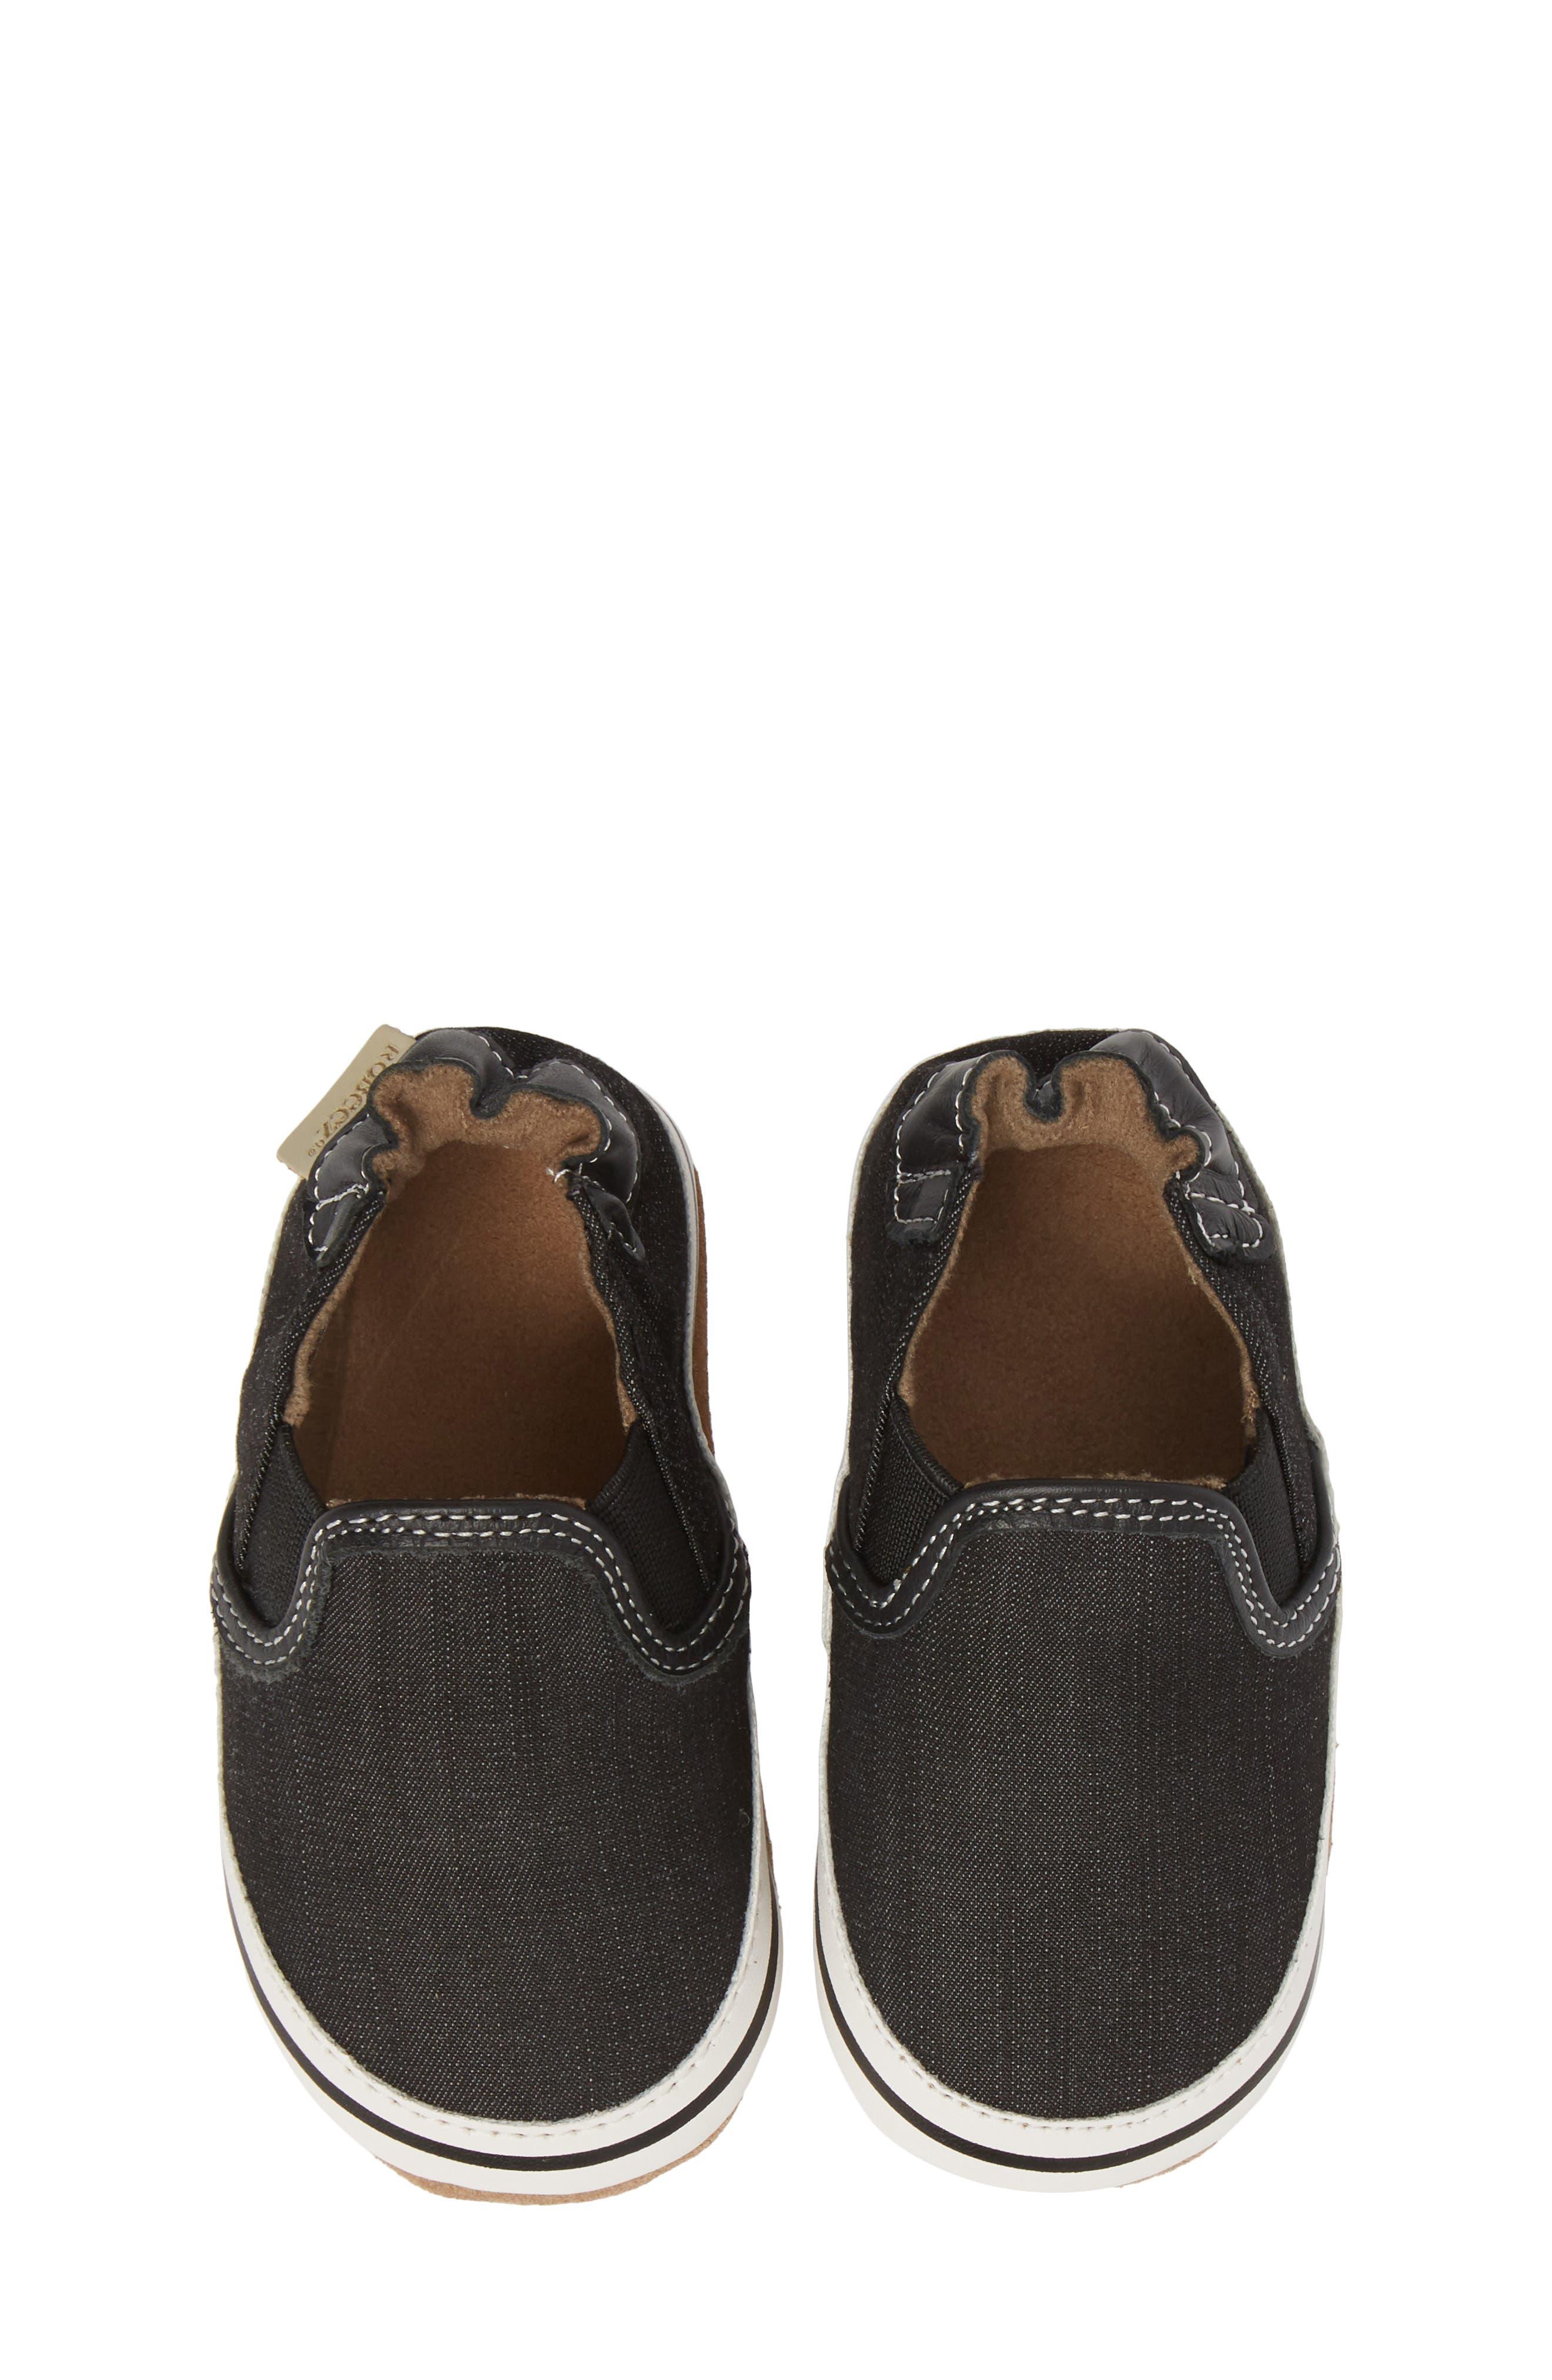 ROBEEZ<SUP>®</SUP>, Liam Slip-On Crib Sneaker, Alternate thumbnail 5, color, BLACK